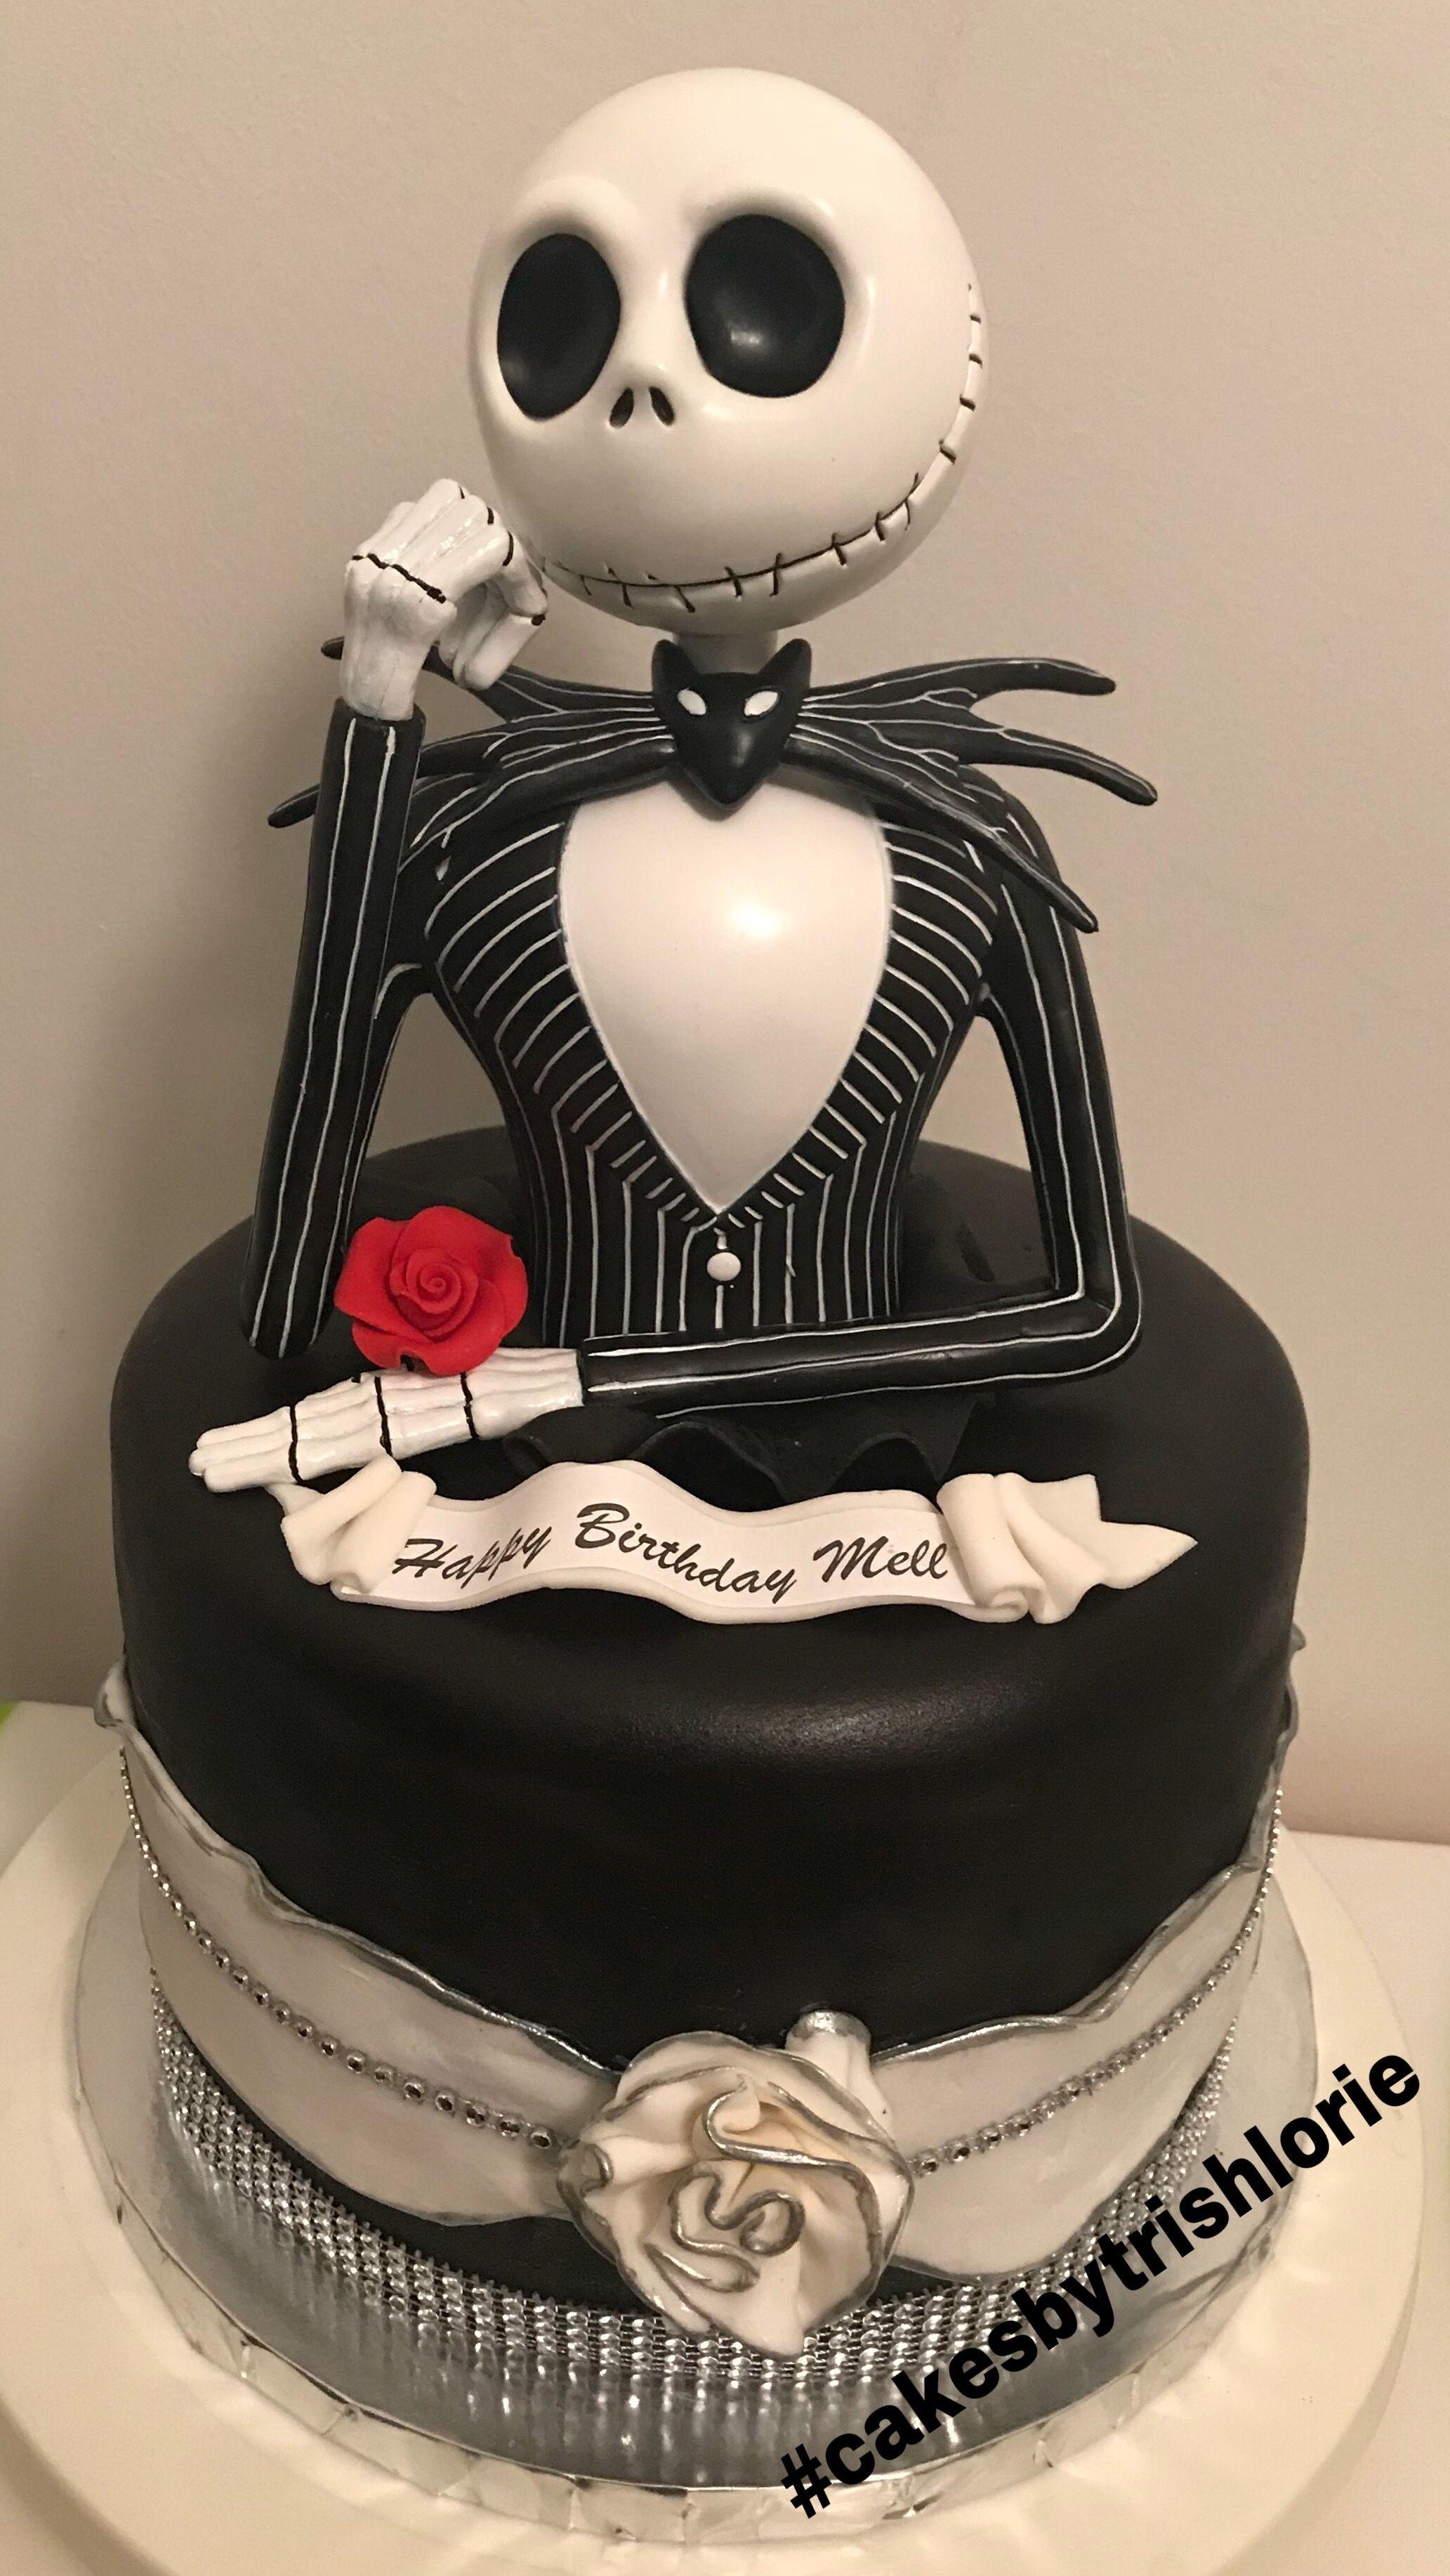 Jack Skellington Cake With Images Jack Skellington Cake Cake